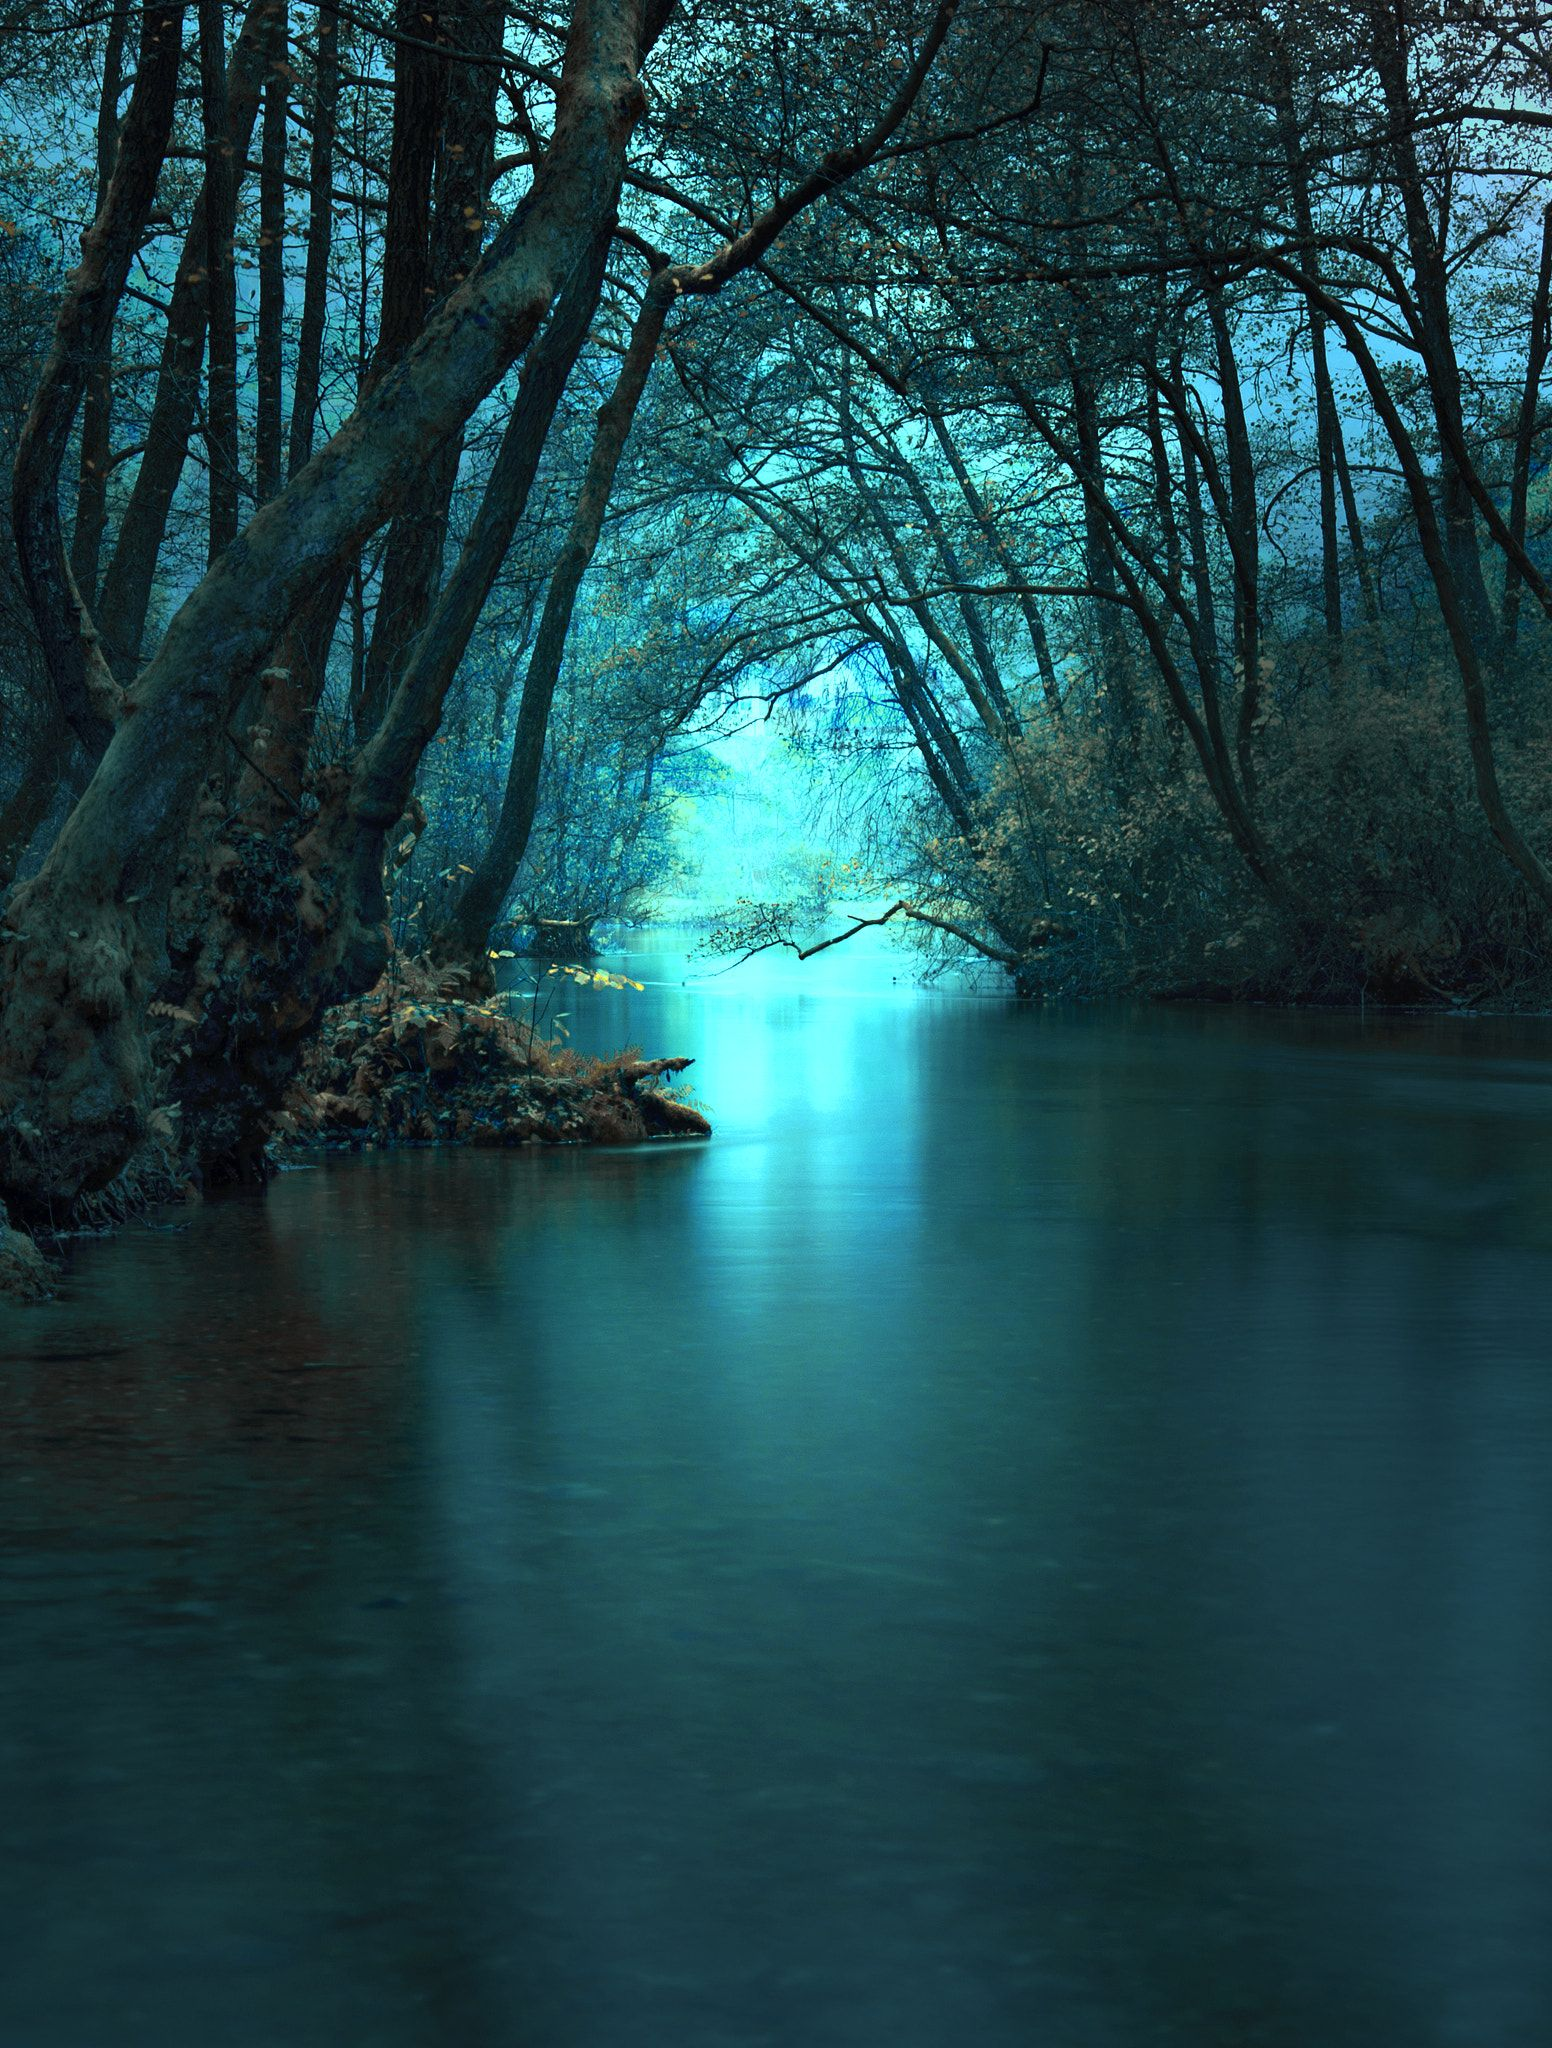 River Nature Impression 美しい風景 風景 美しい風景写真